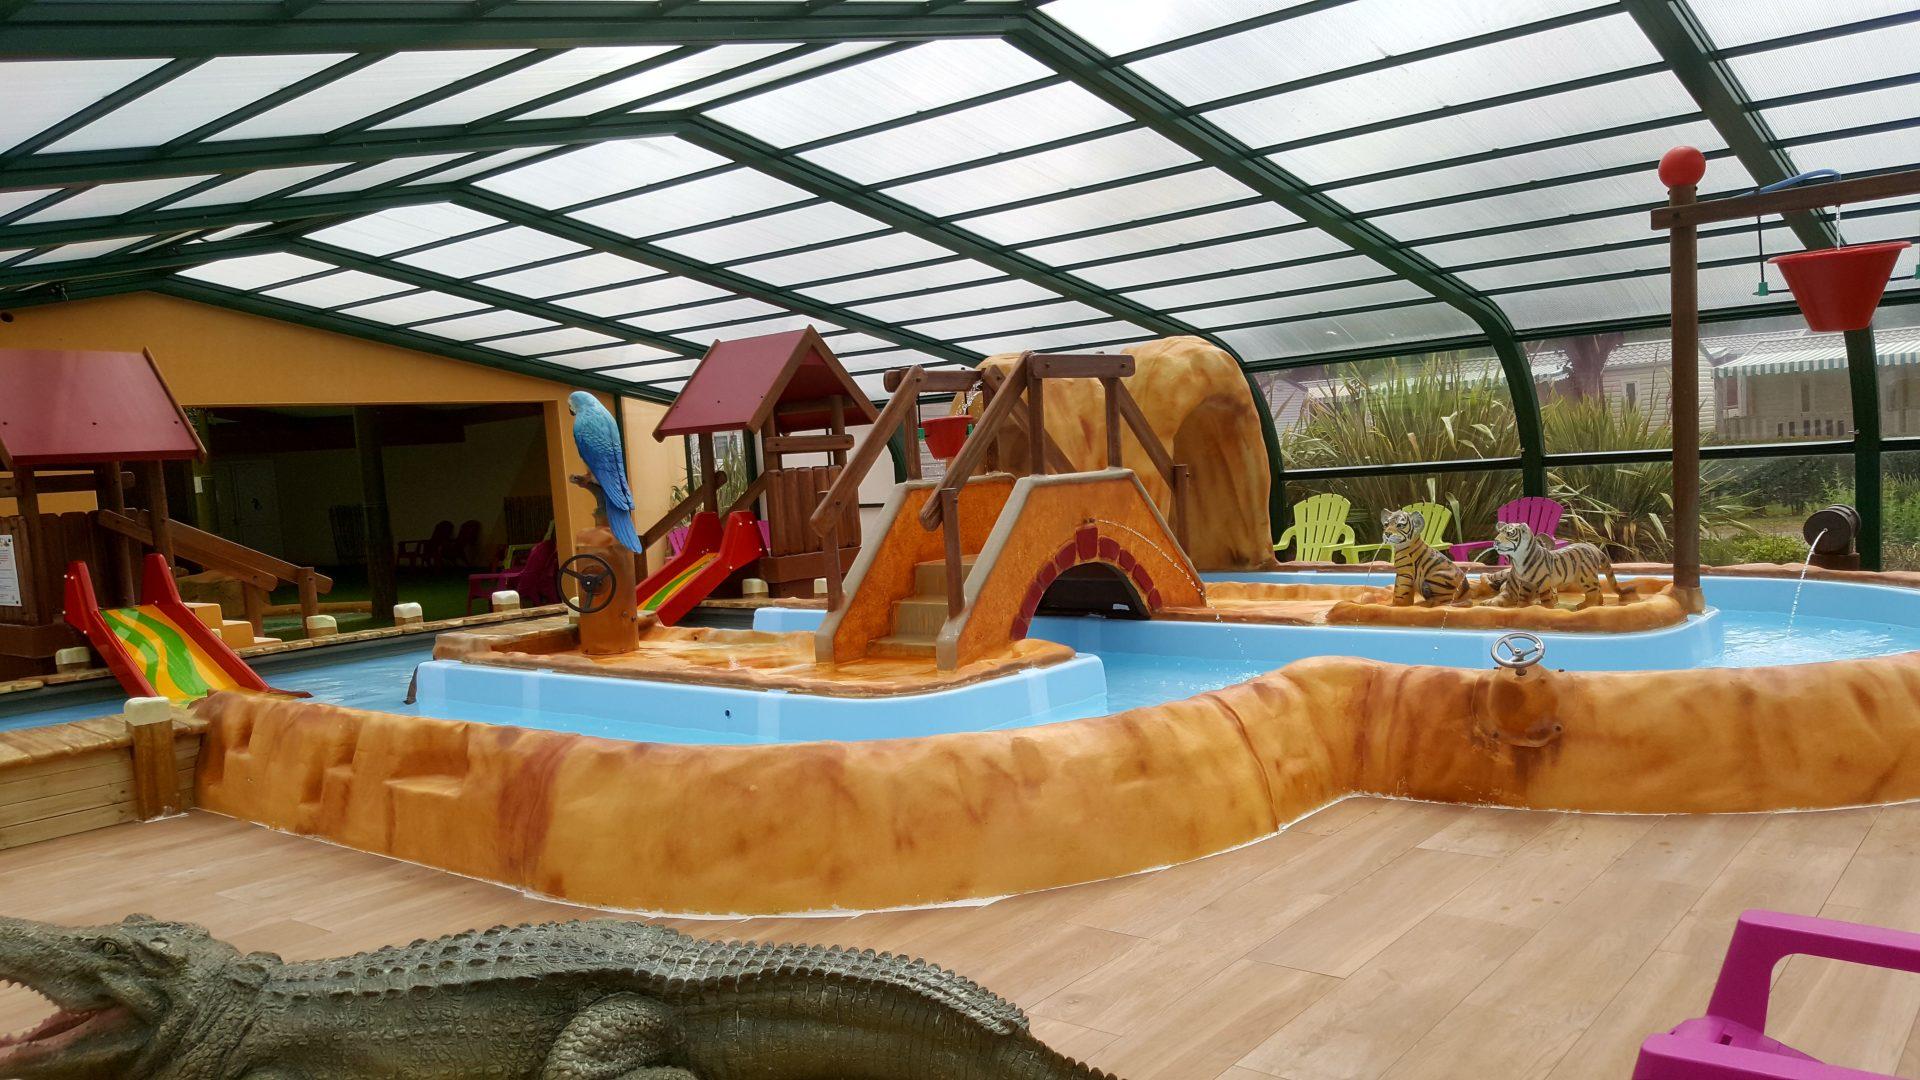 interieur-piscine-ludique-camping-domaine-de-l-oree-vendee